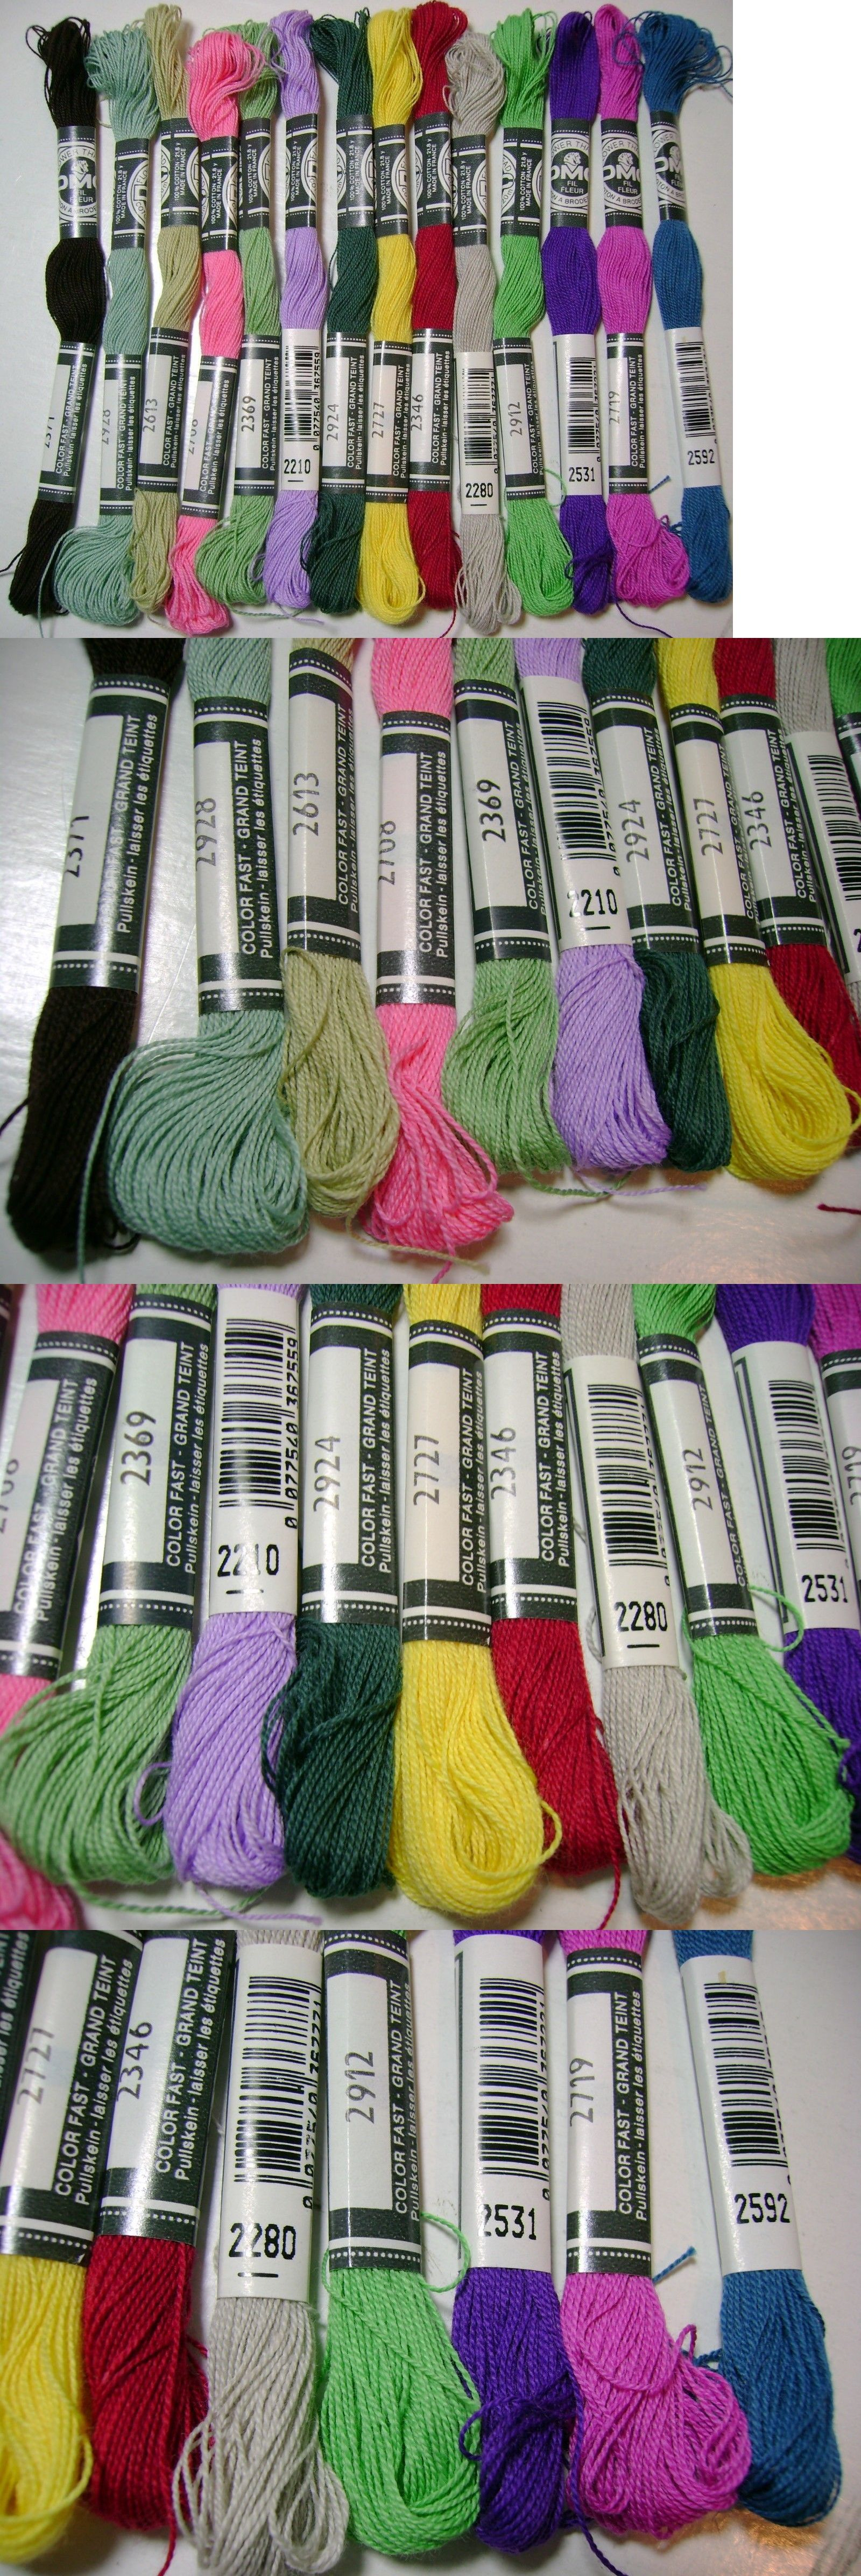 Hand Embroidery Floss And Thread 28144 14 Dmc Flower Thread Embroidery Floss 14 Colors Nos B Buy It Now Only 12 86 Embroidery Floss Floss Hand Embroidery